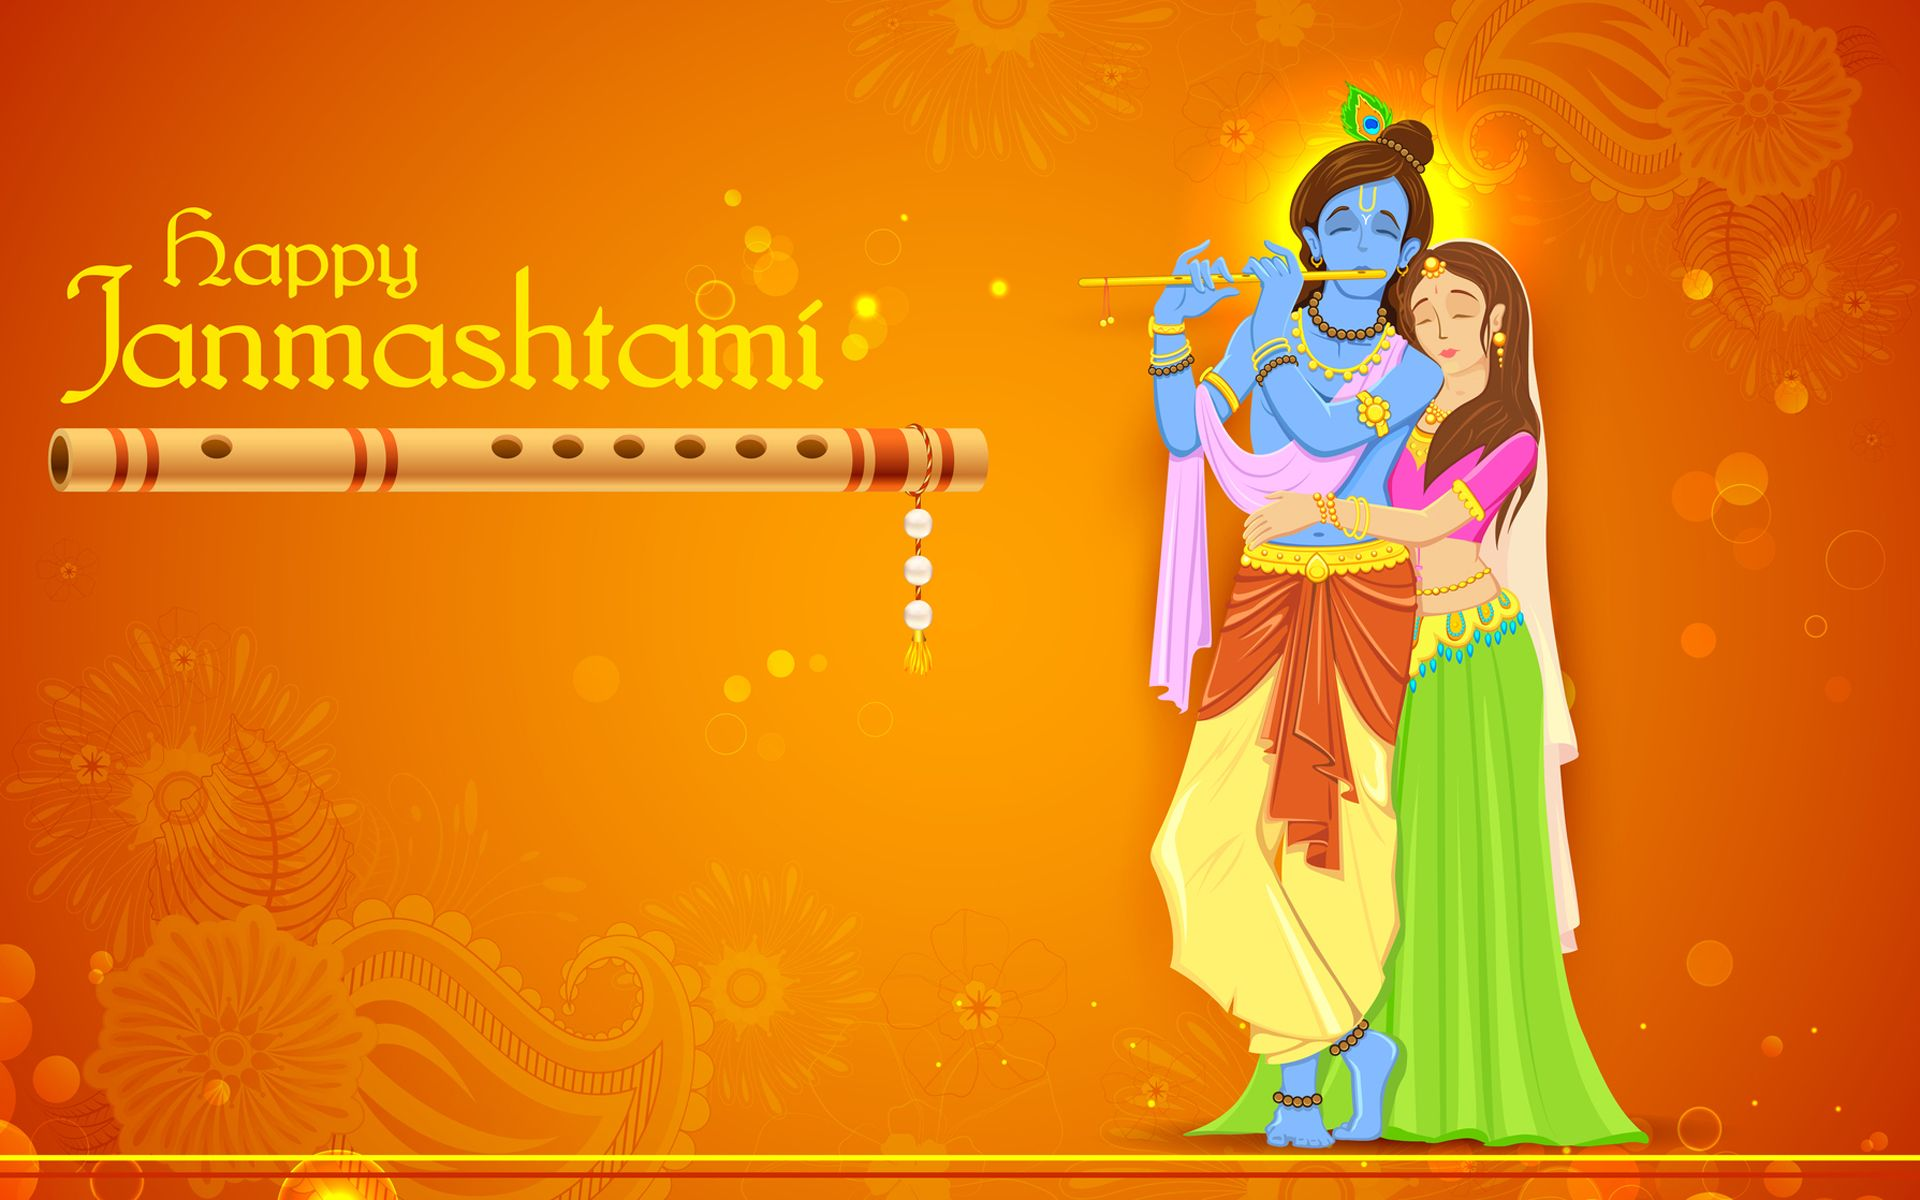 Happy Janmashtami Wishes Greetings Thoughts Sayings Shlok Lord Krishna Krishna Janmashtami Happy Janmashtami Janmashtami Wishes Janmashtami Wallpapers